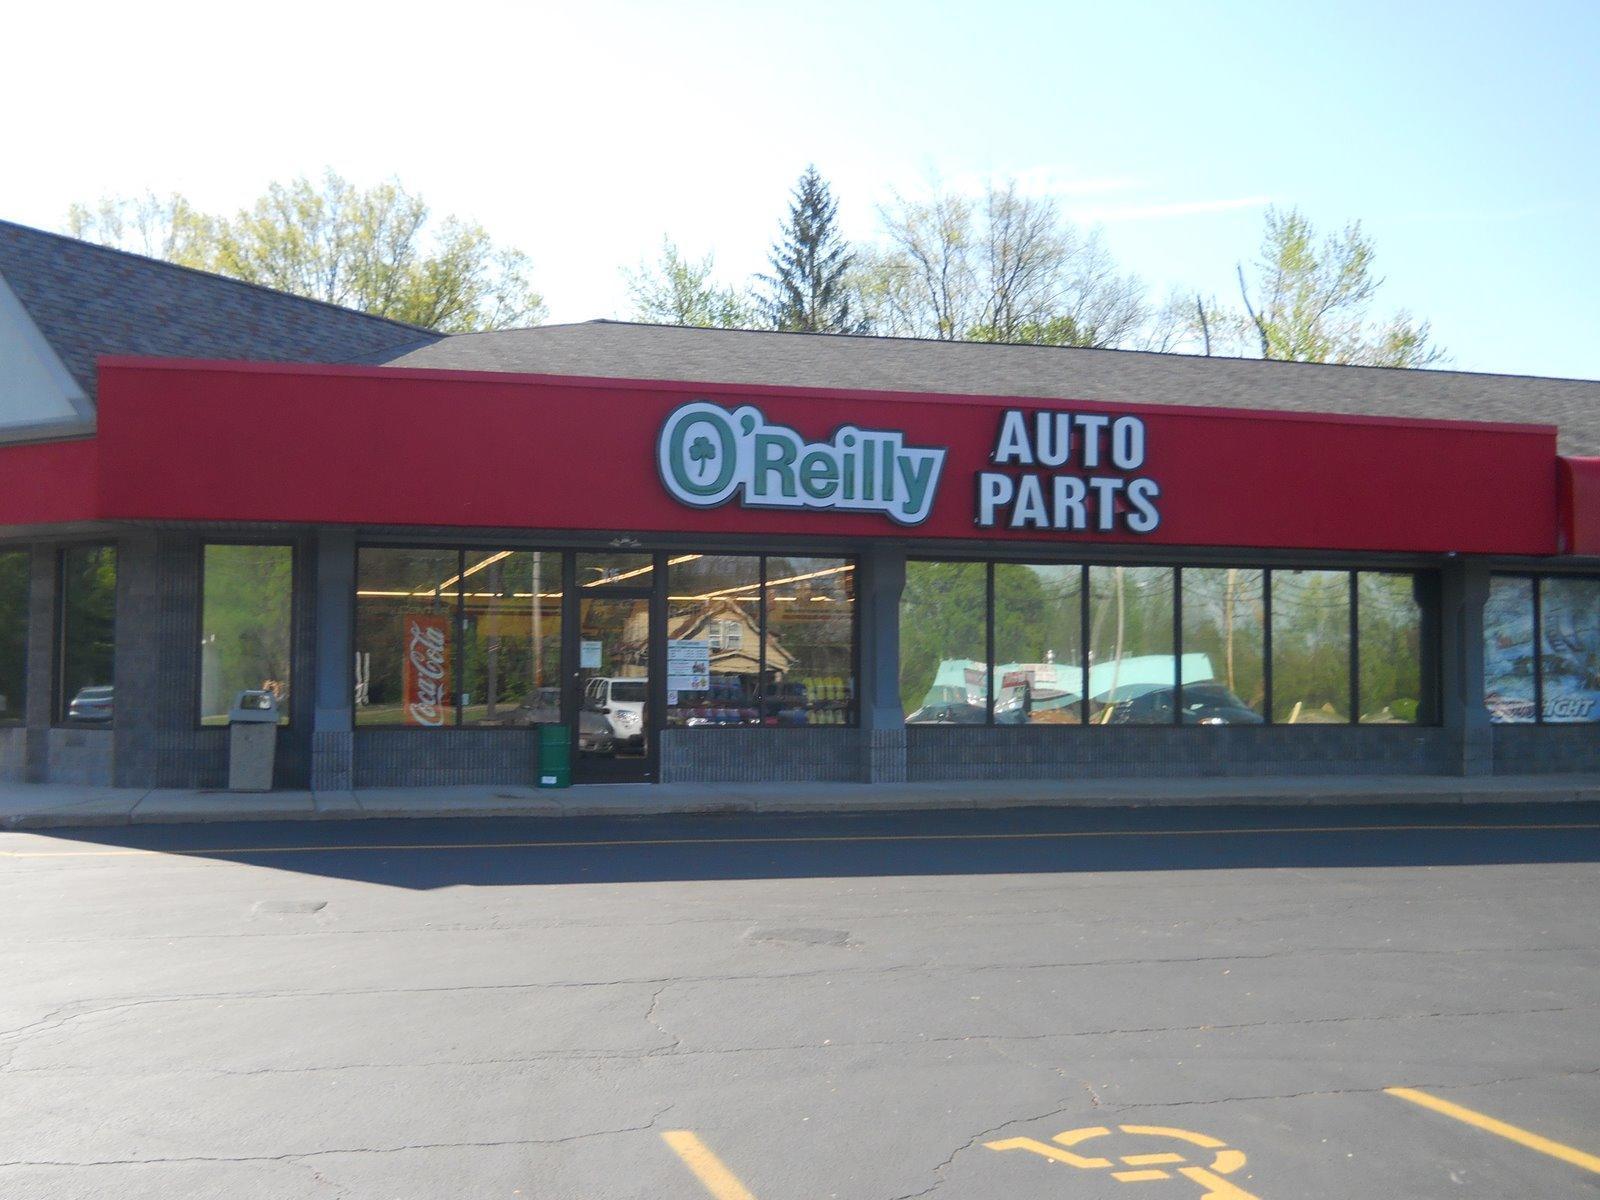 o'reilly auto parts - photo #6